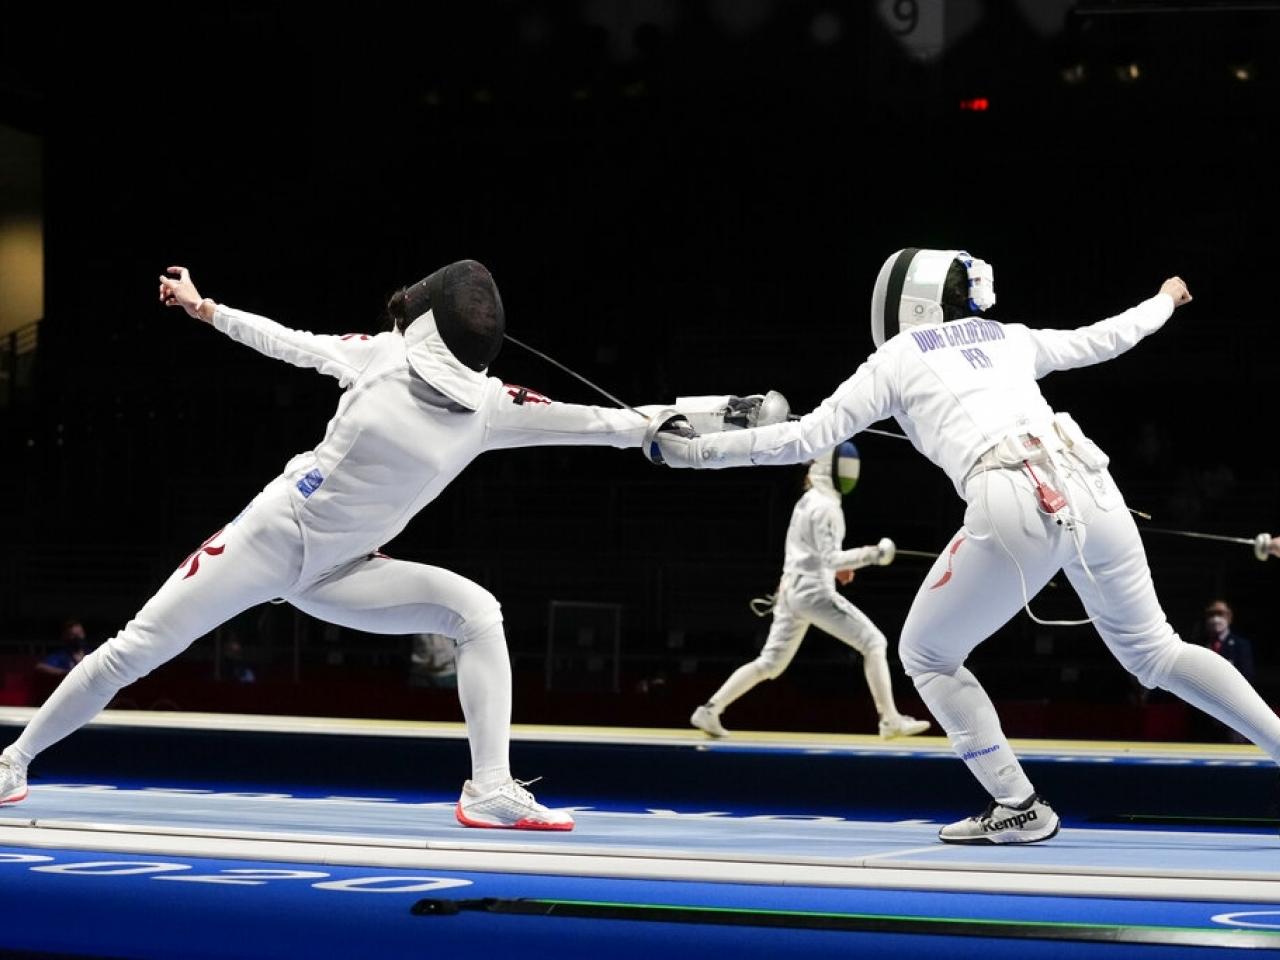 HK athletes make progress on day one of Olympics